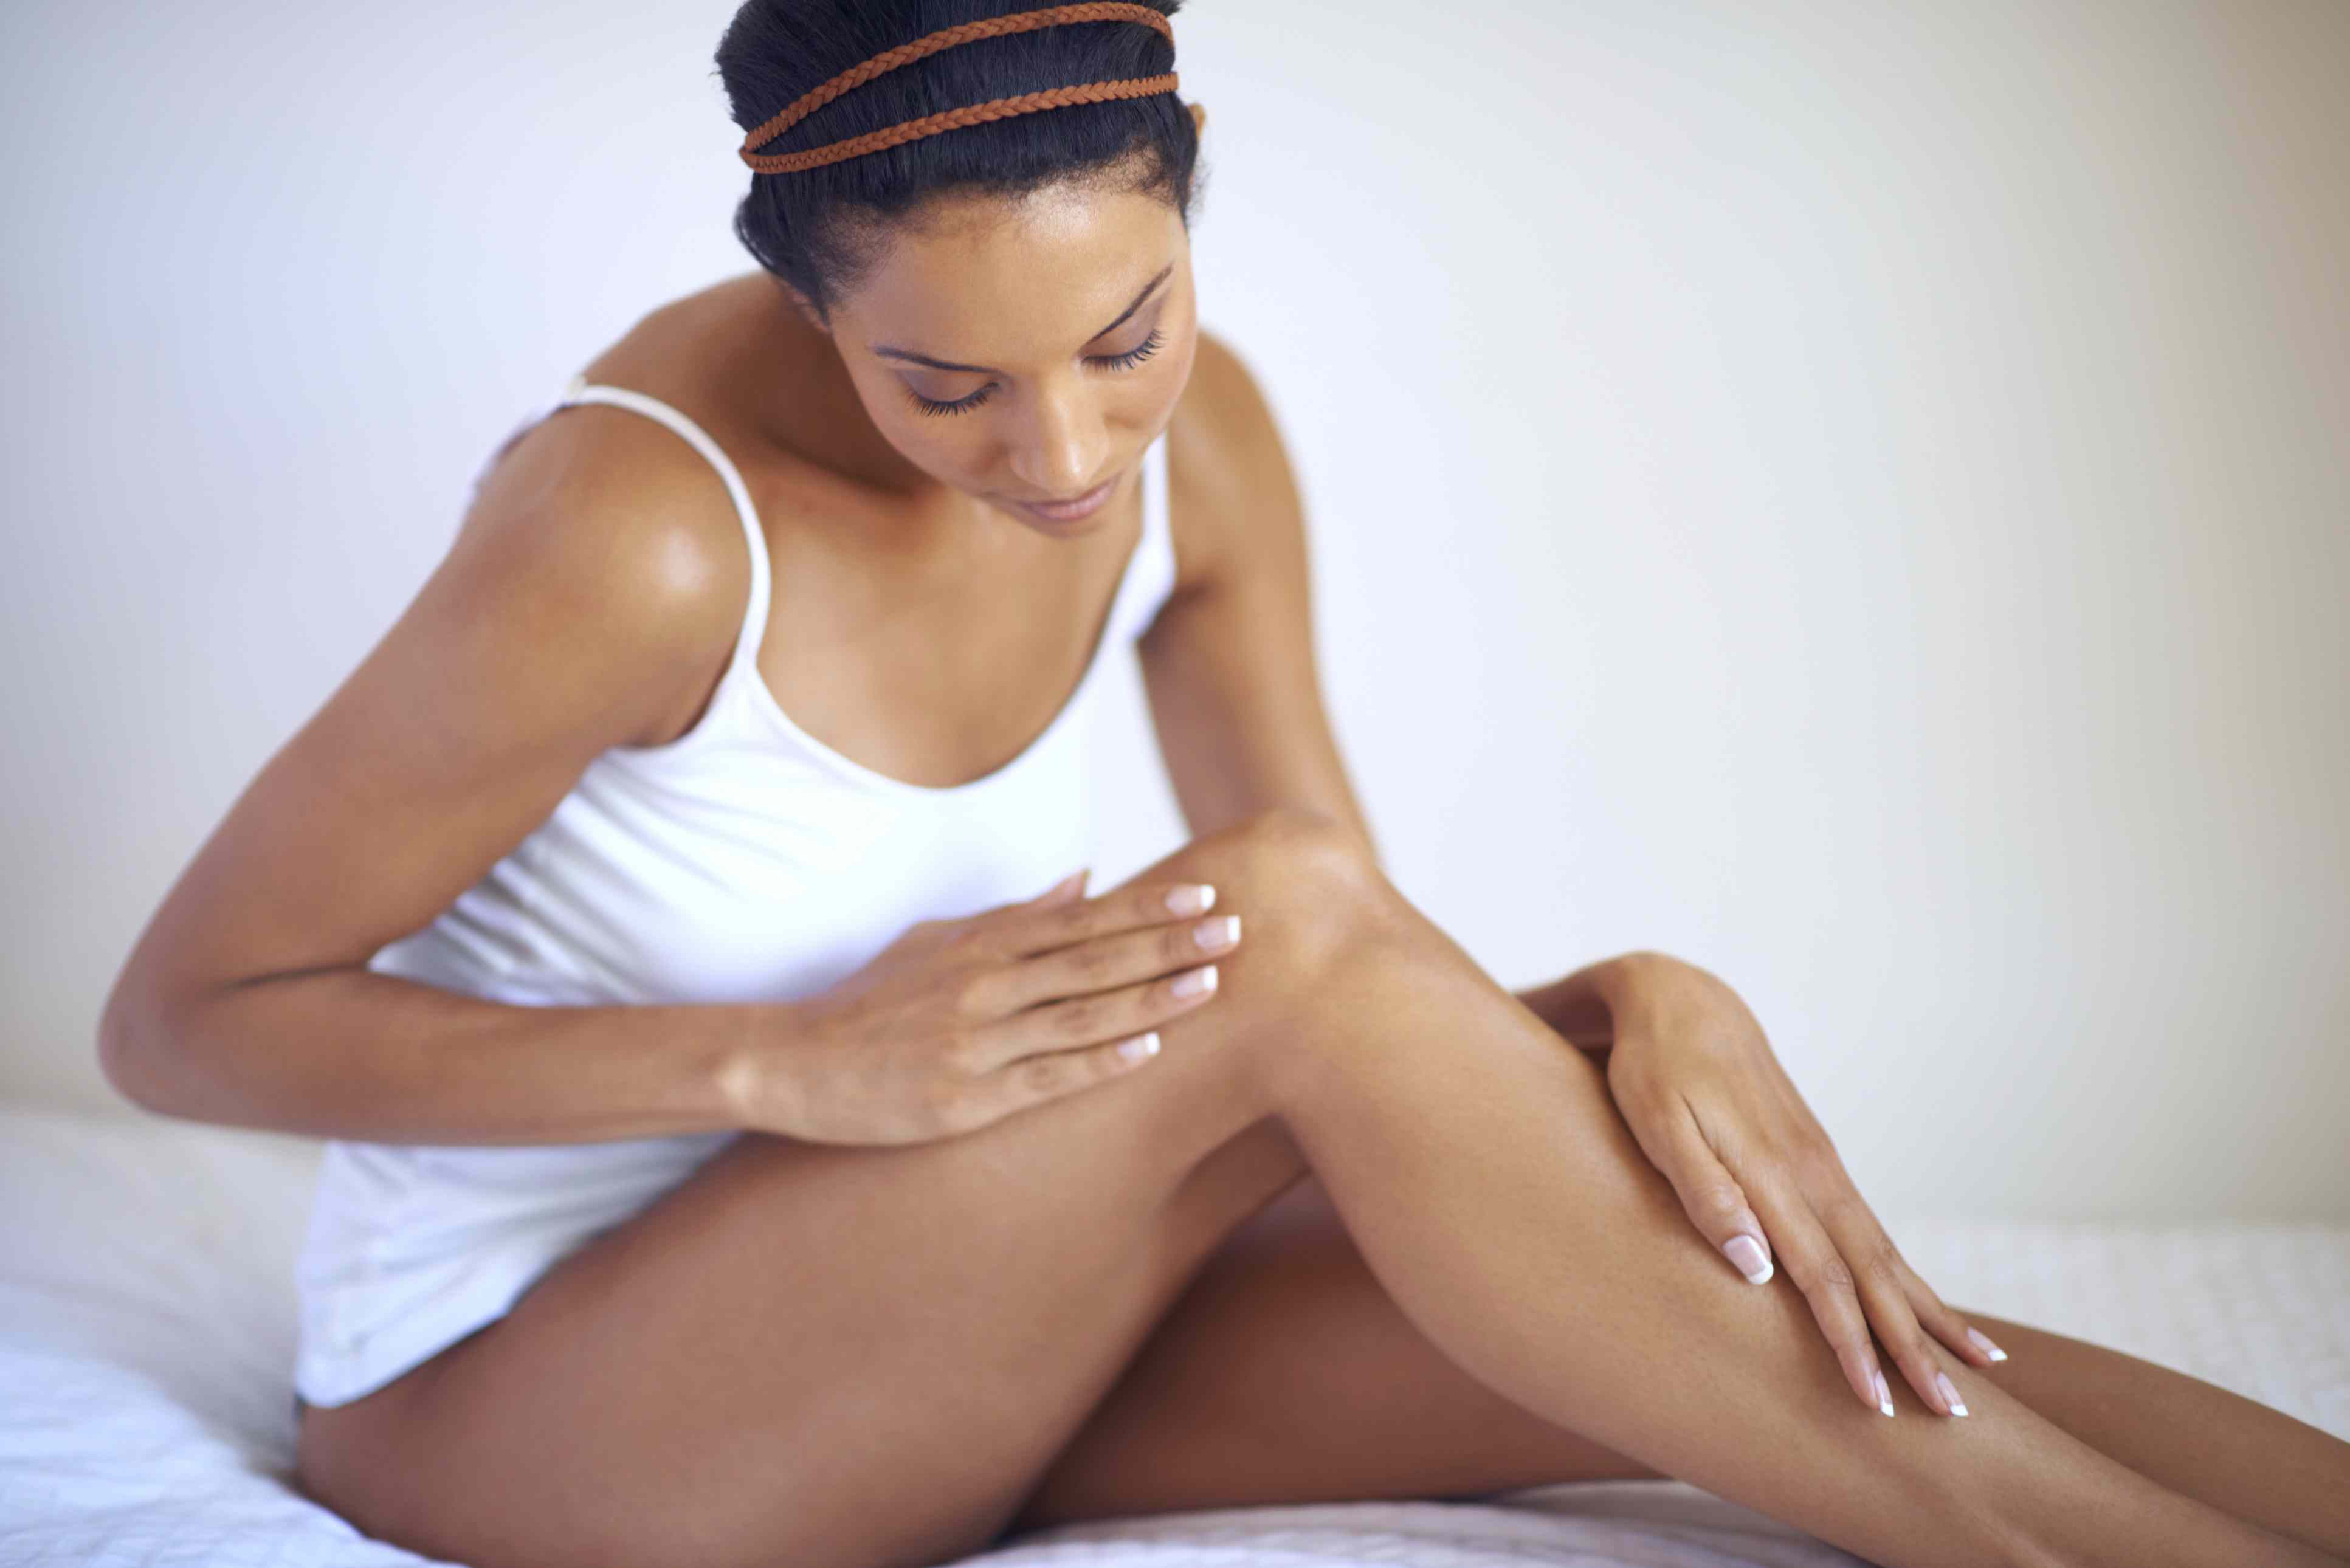 Woman examining her leg